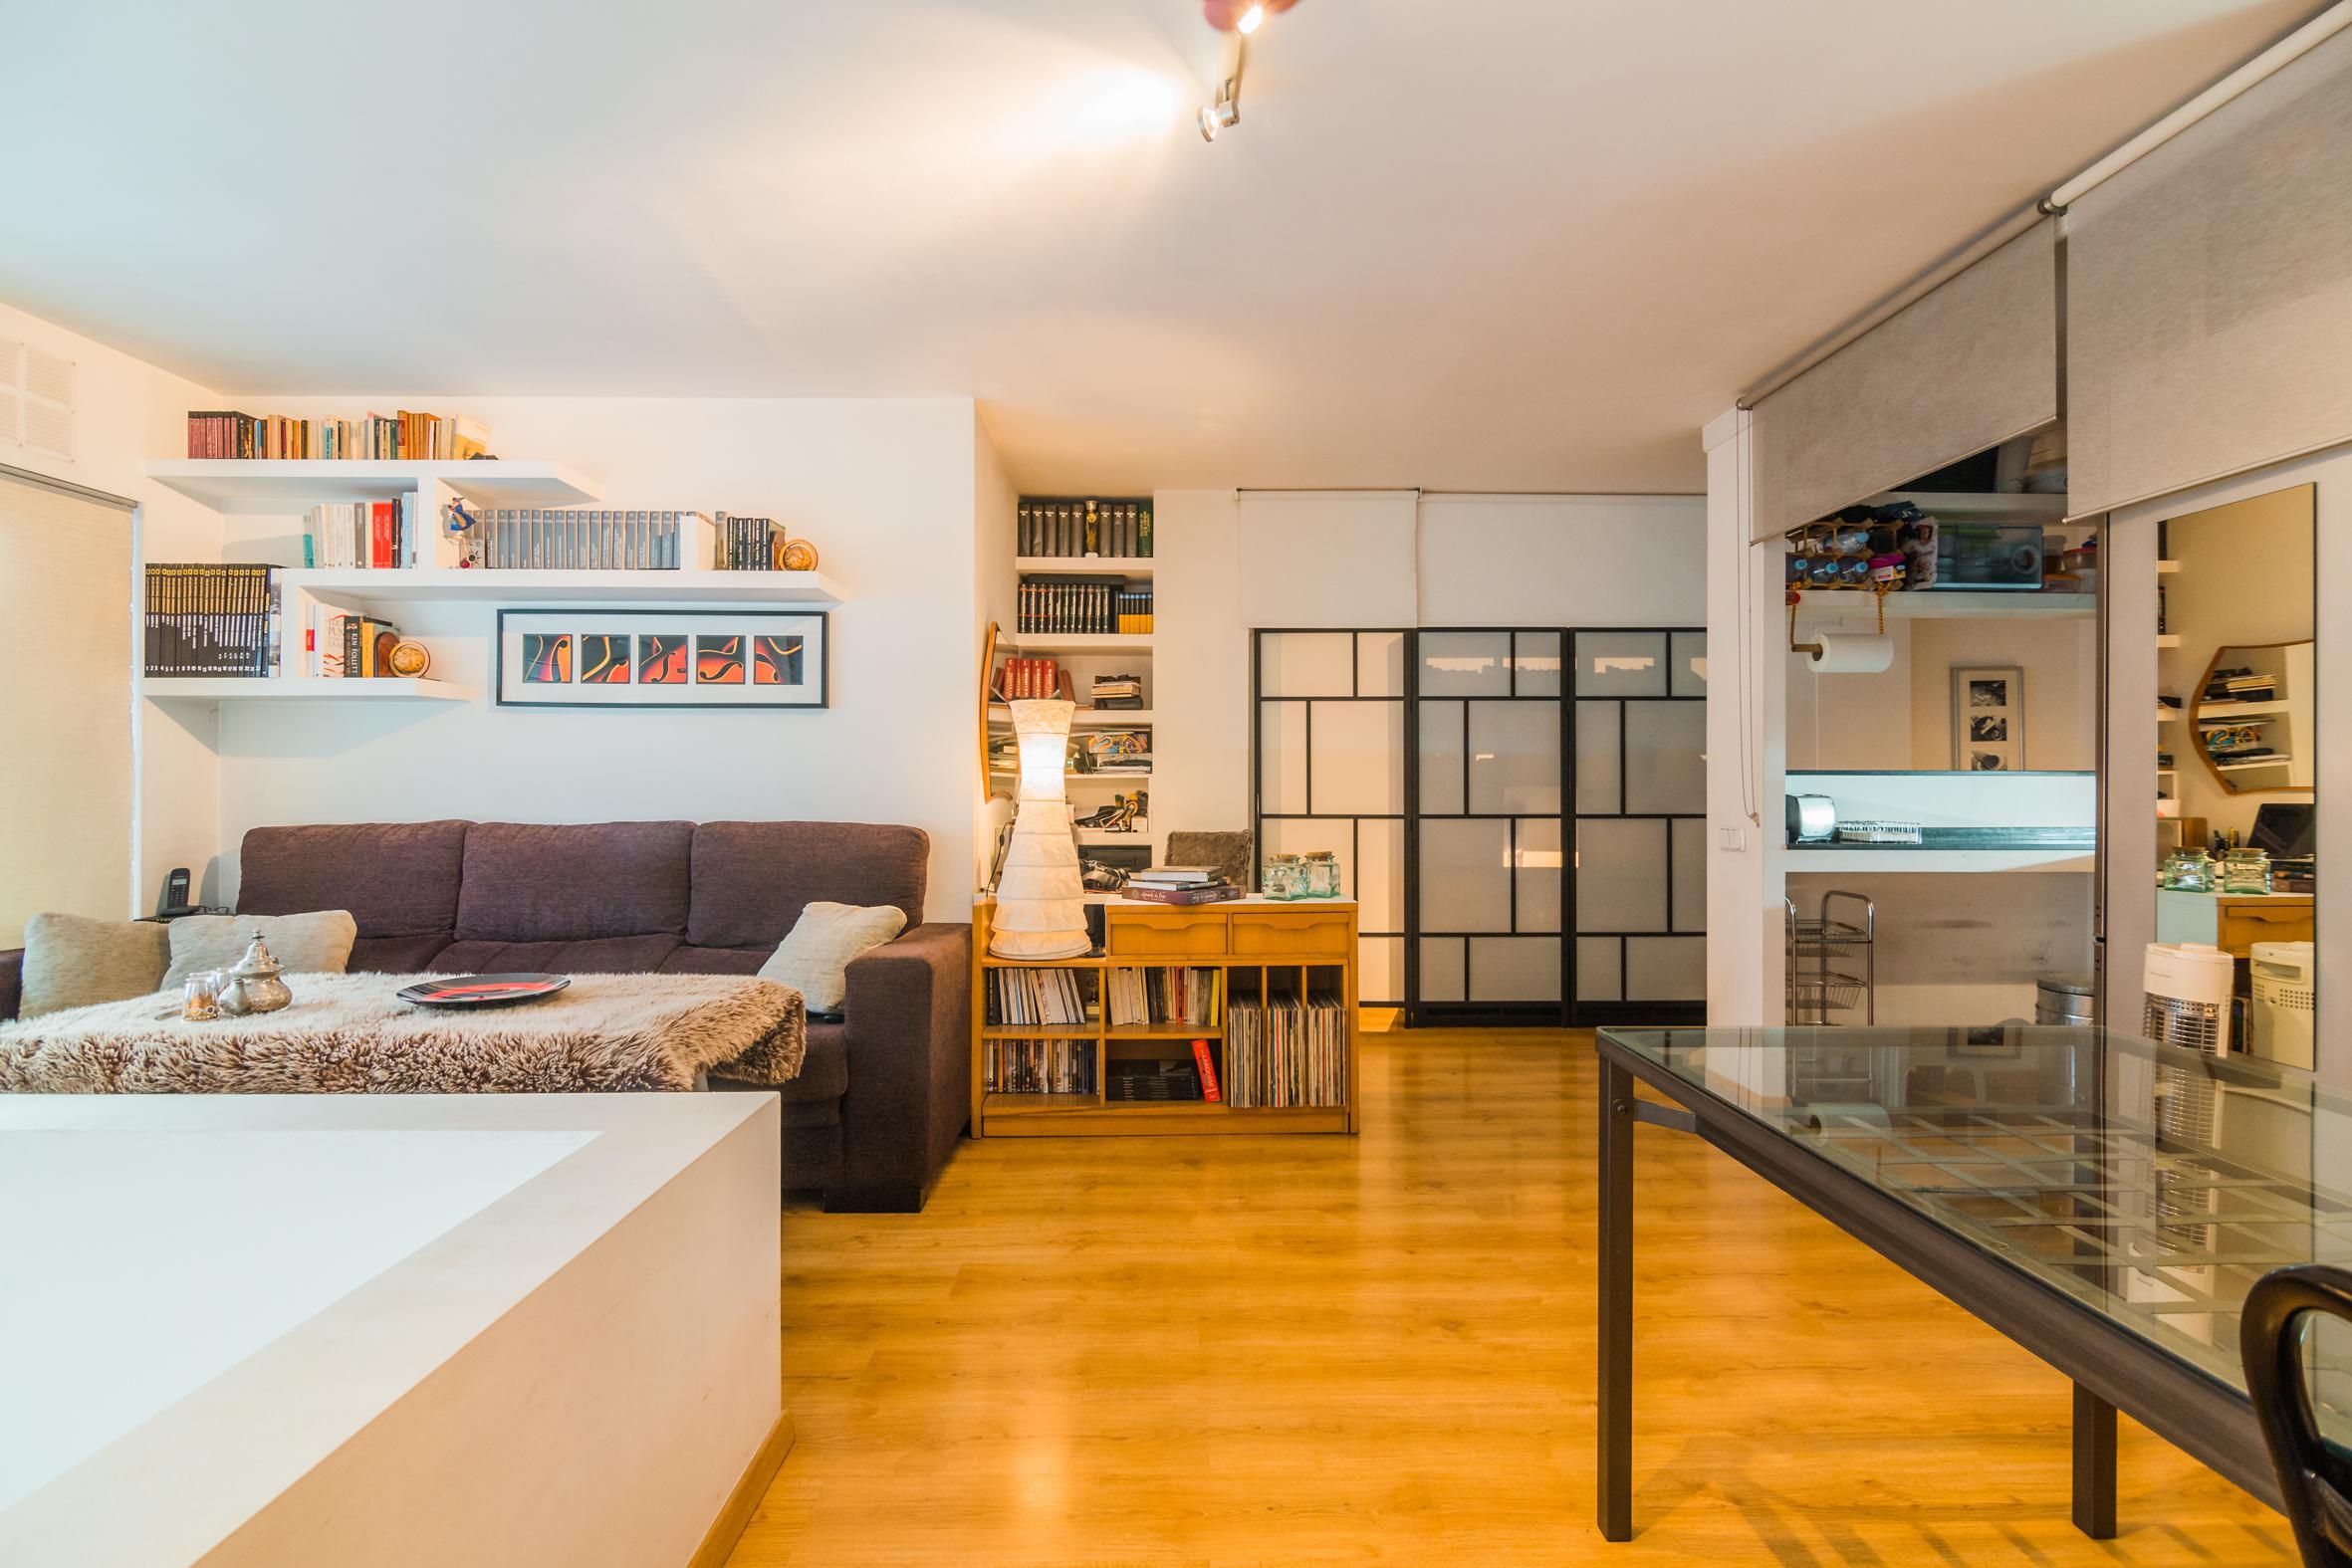 200071 Estudio en venta en Sants-Montjuïc, Poble Sec 4